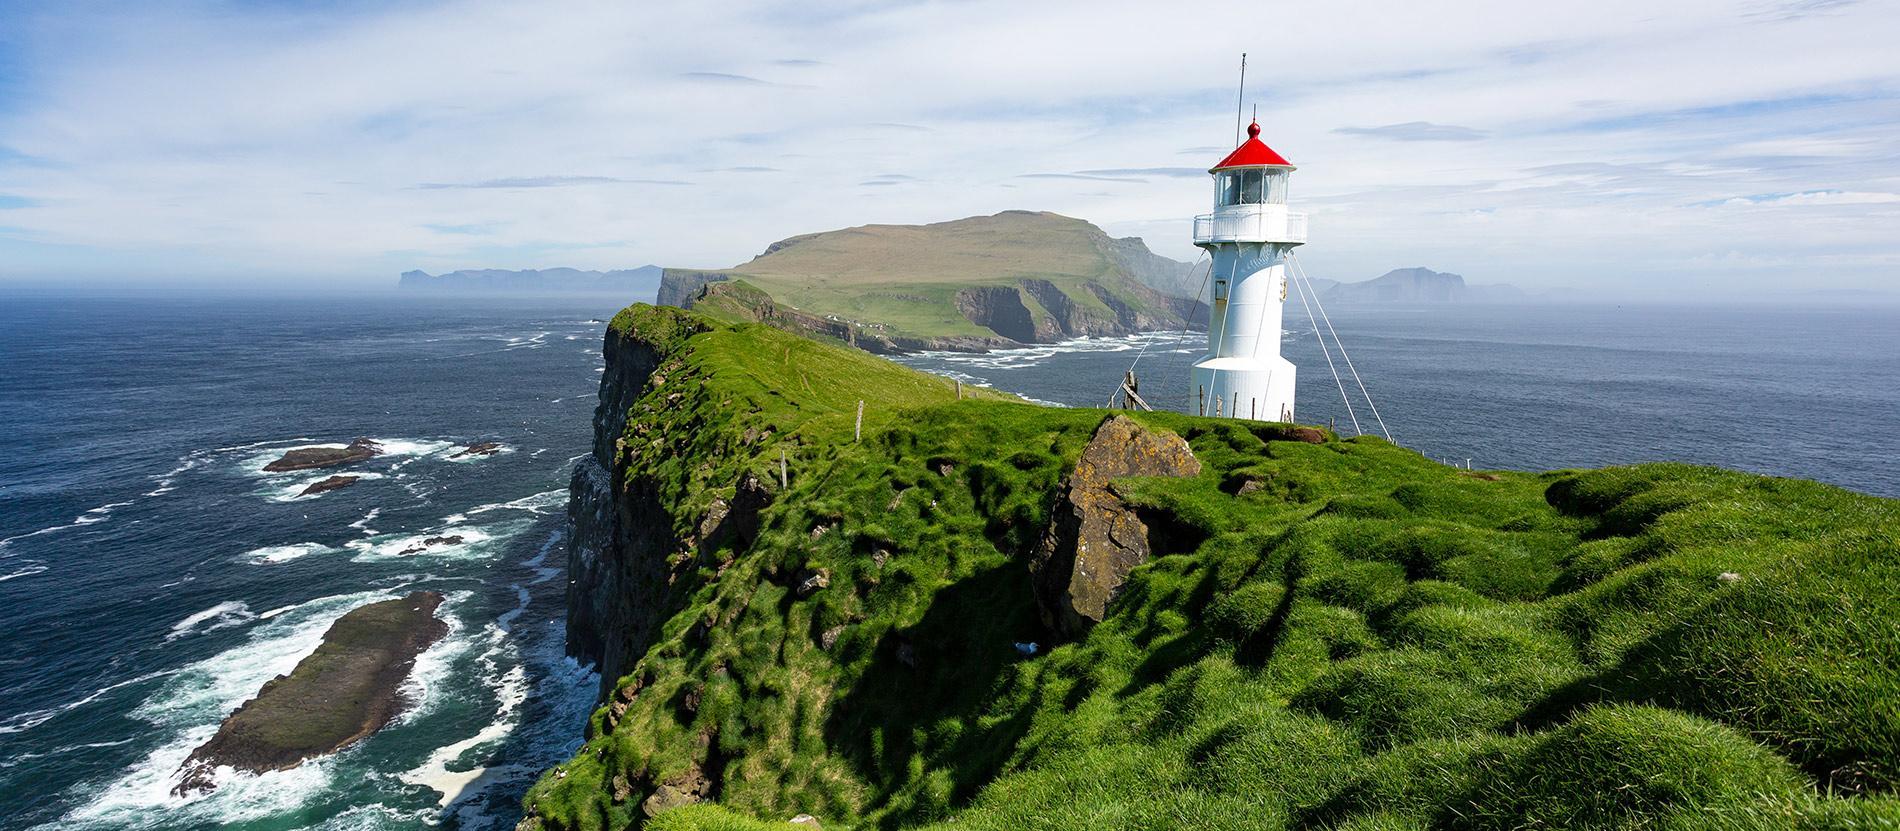 Norway To Iceland Cruise 2019 Amp 2020 Scandinavia Cruise